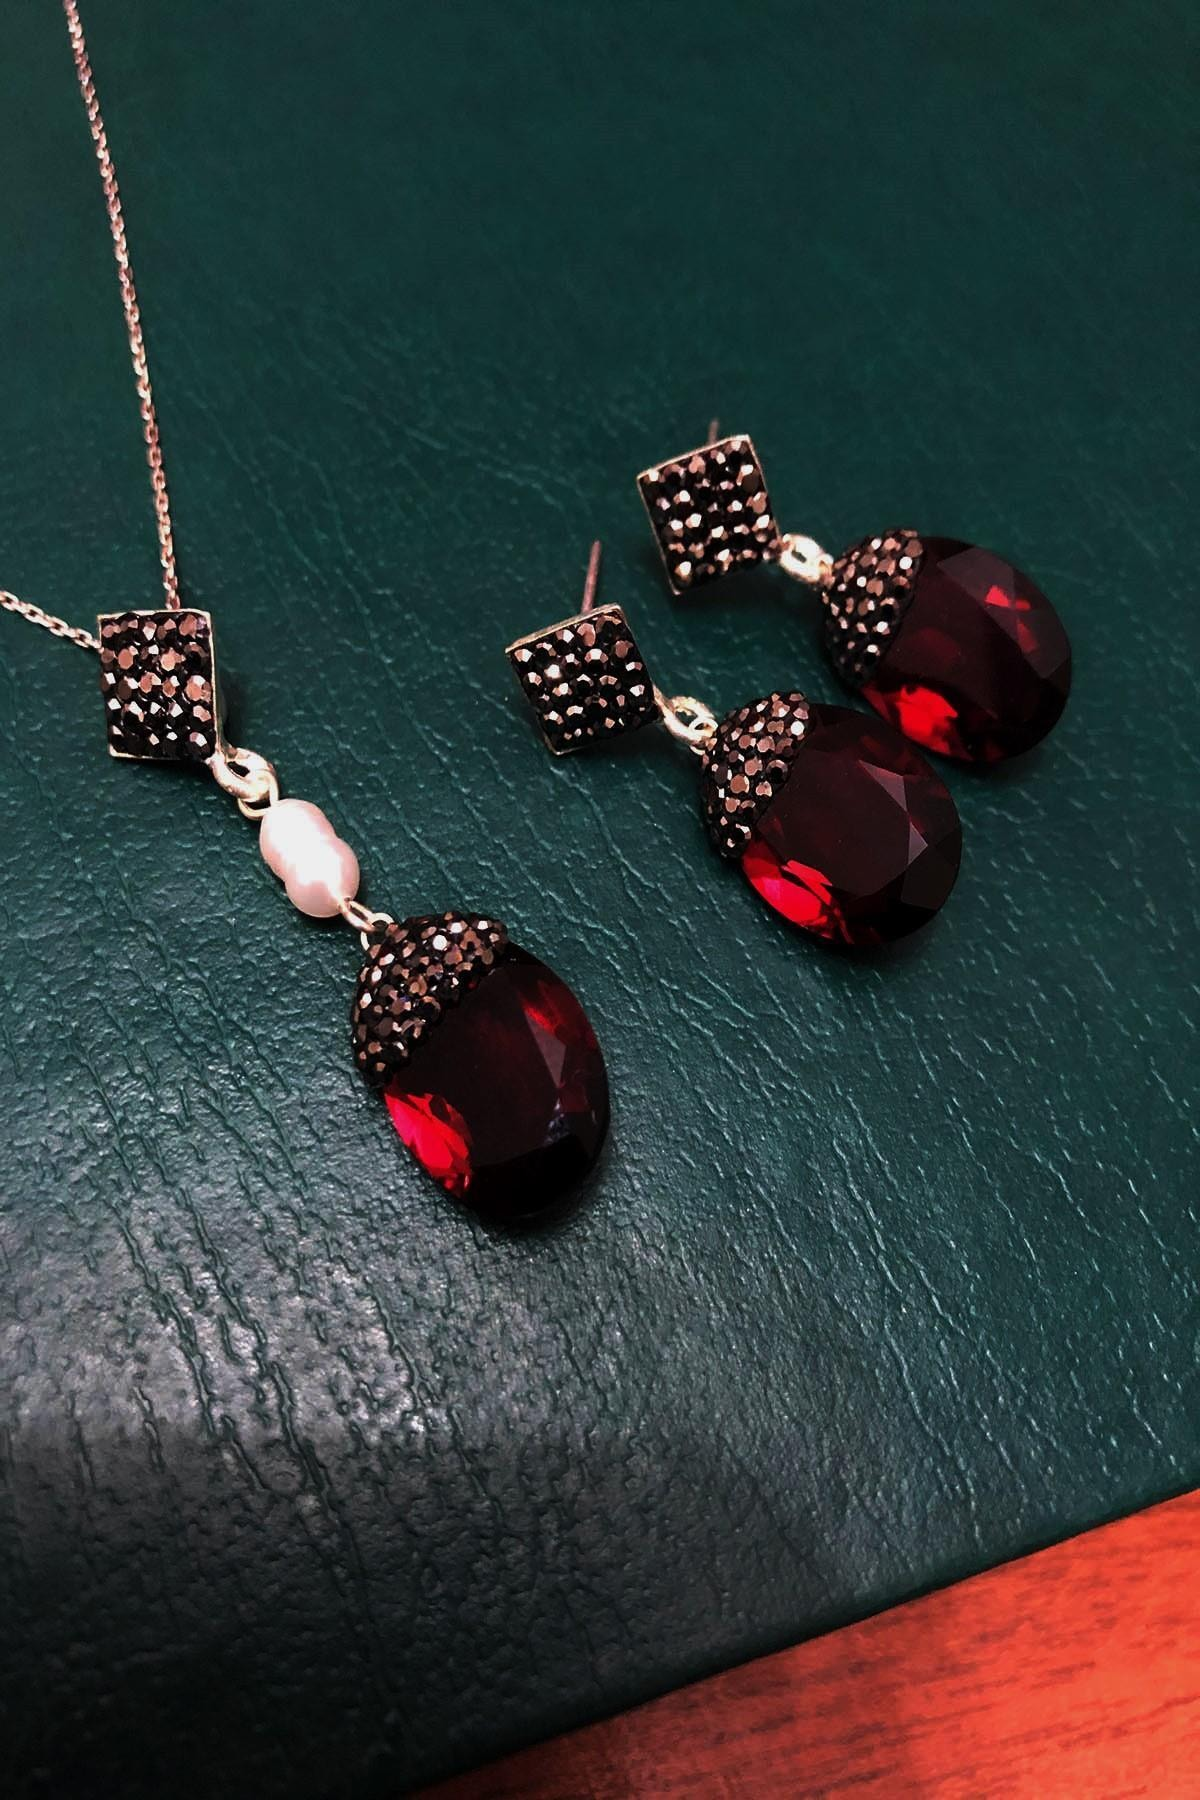 Dr. Stone Yakut Rengi Hindistan Kristali ve İnci Gümüş Kadın Set Xdrsott3 1